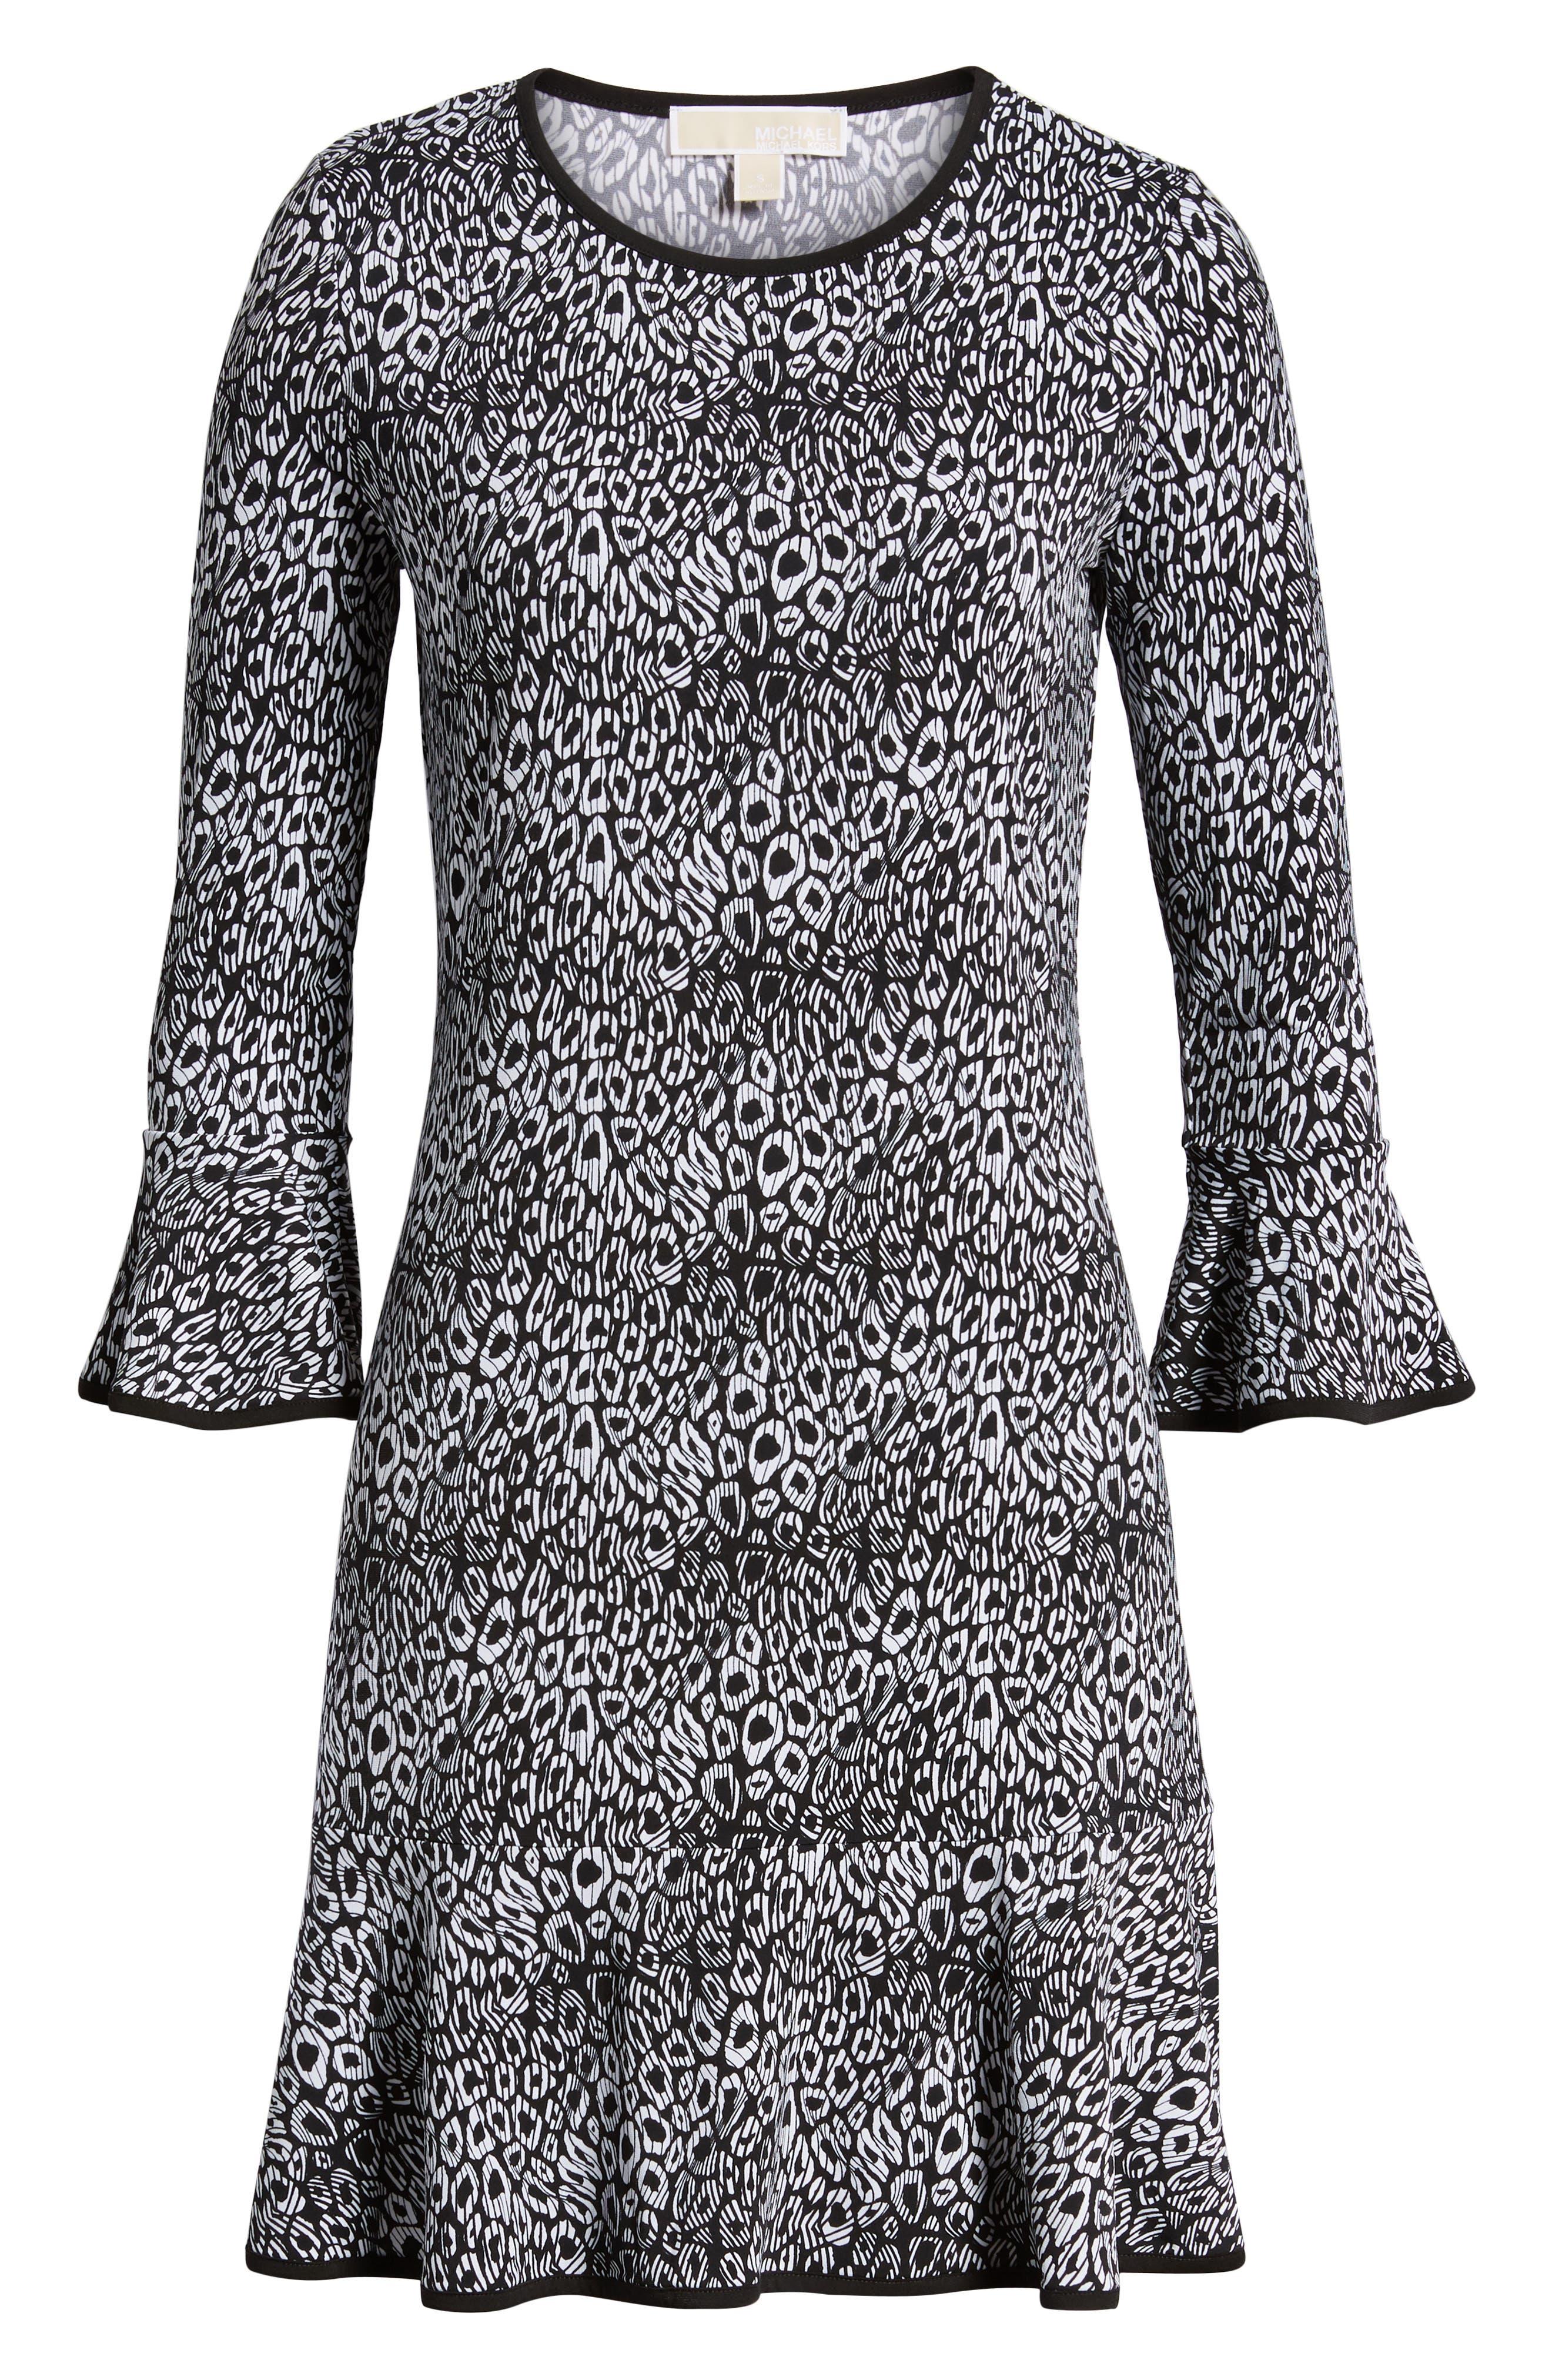 Wavy Leopard Flounce Dress,                             Alternate thumbnail 7, color,                             001